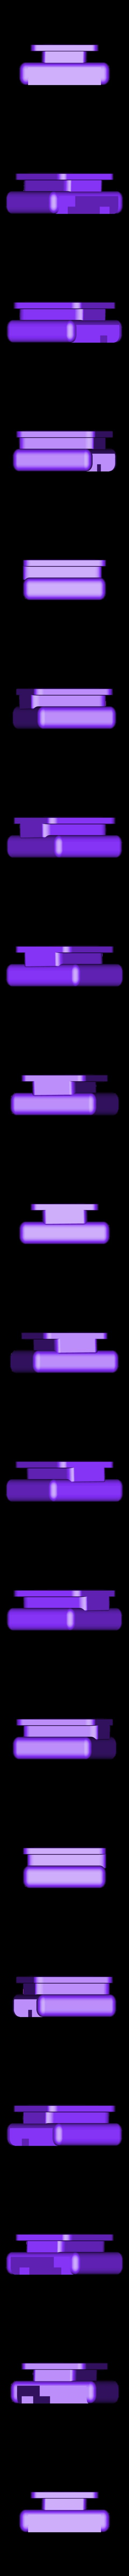 yongnuo_new_speedmount.stl Download free STL file YONGNUO NEW SPEEDMOUNT • Design to 3D print, TASPP